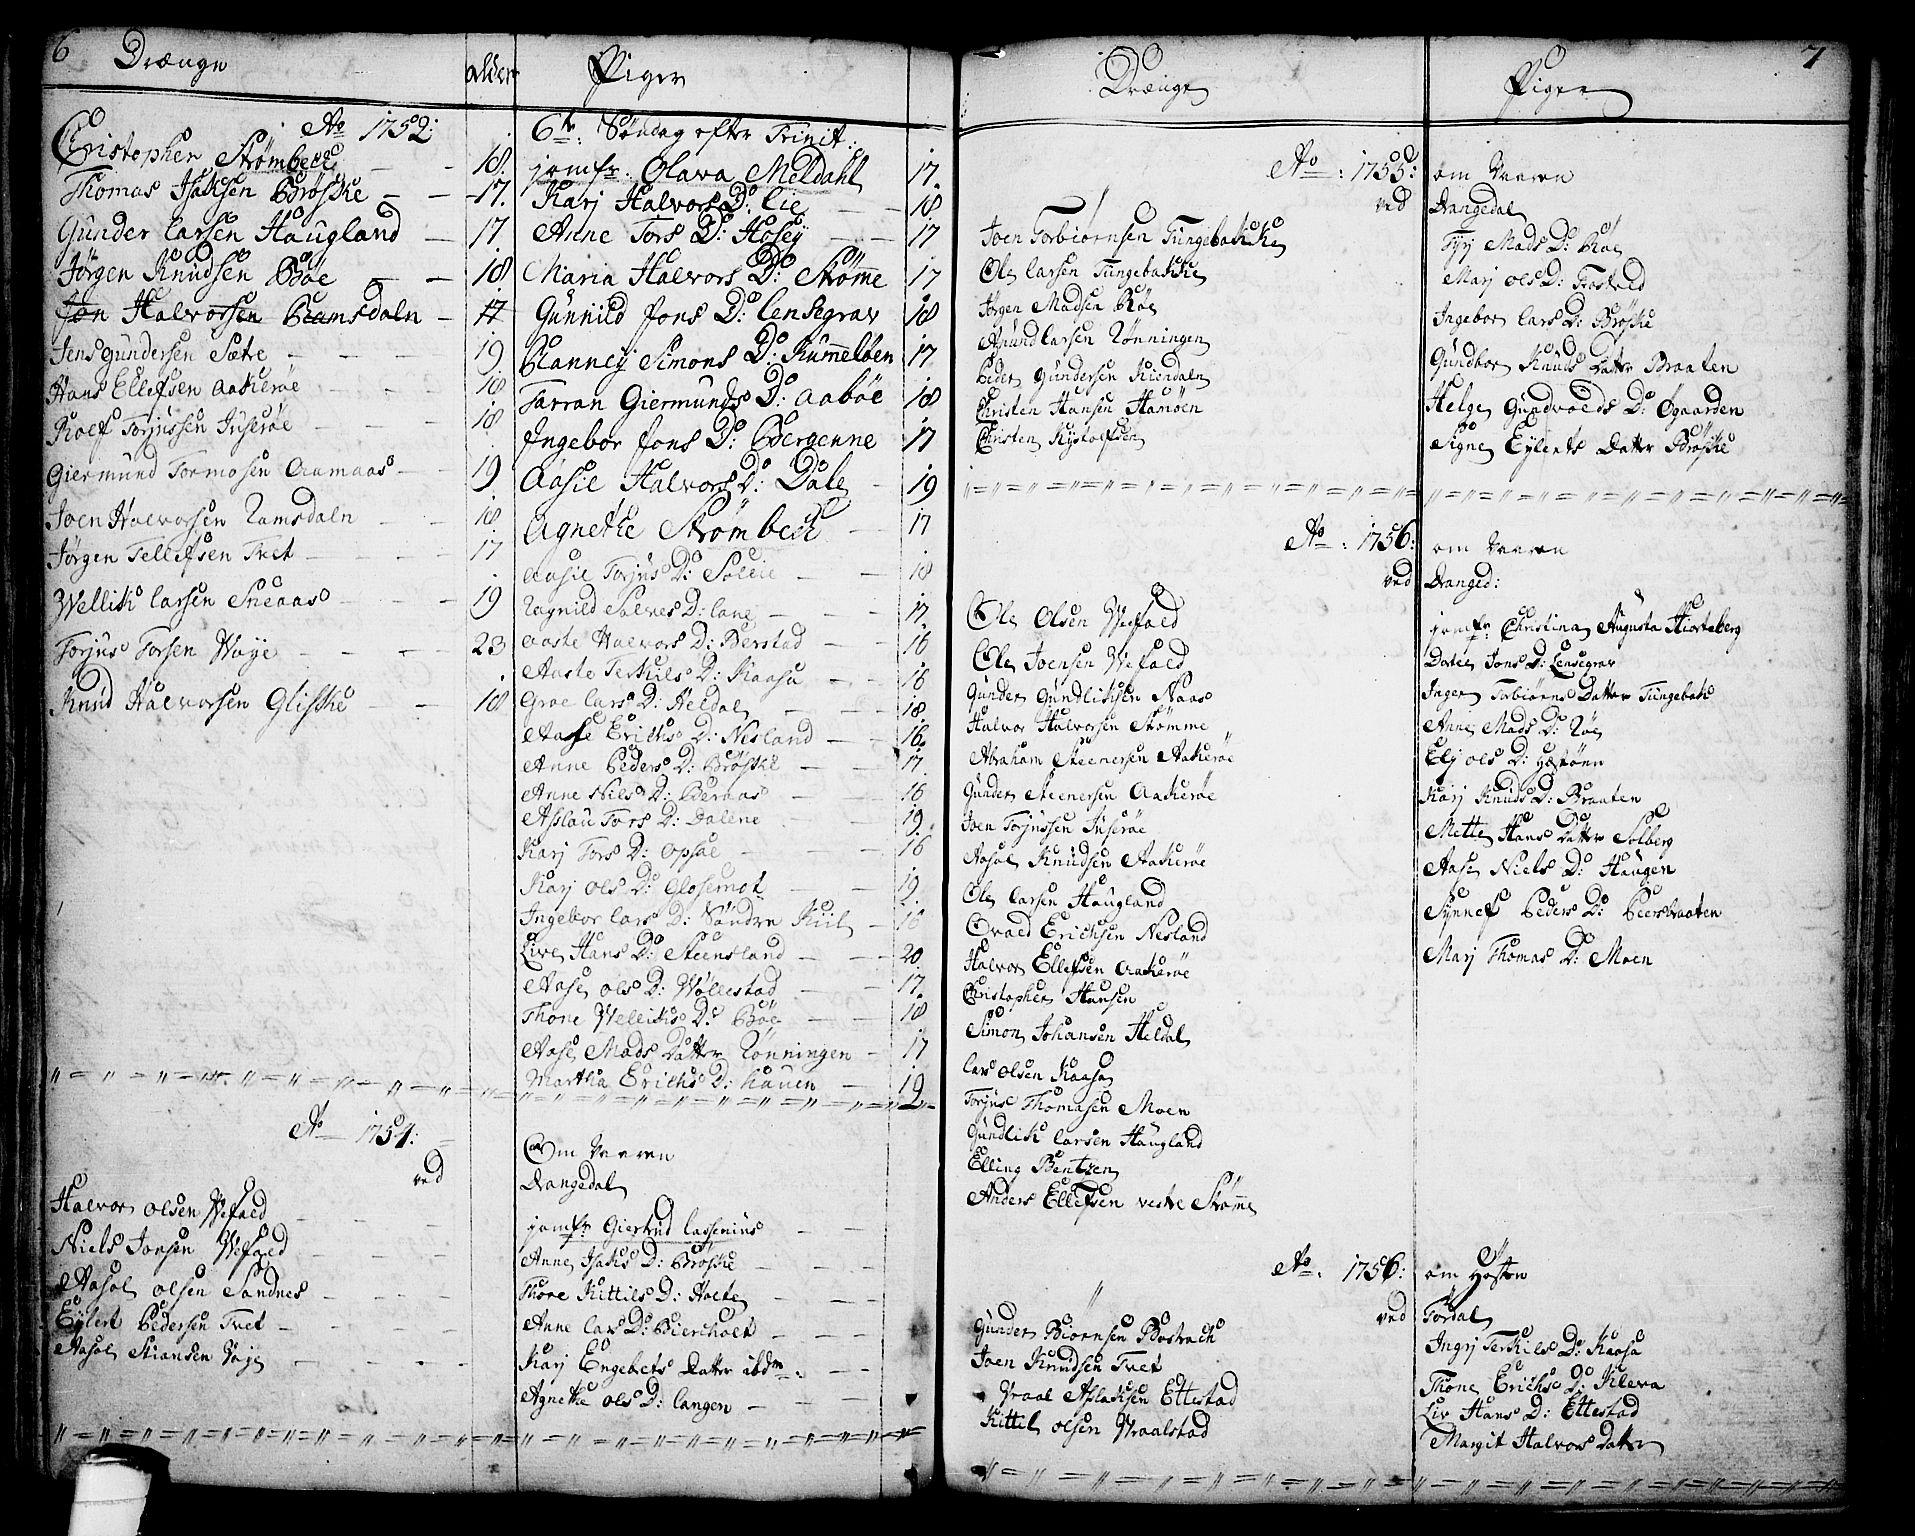 SAKO, Drangedal kirkebøker, F/Fa/L0001: Ministerialbok nr. 1, 1697-1767, s. 6-7